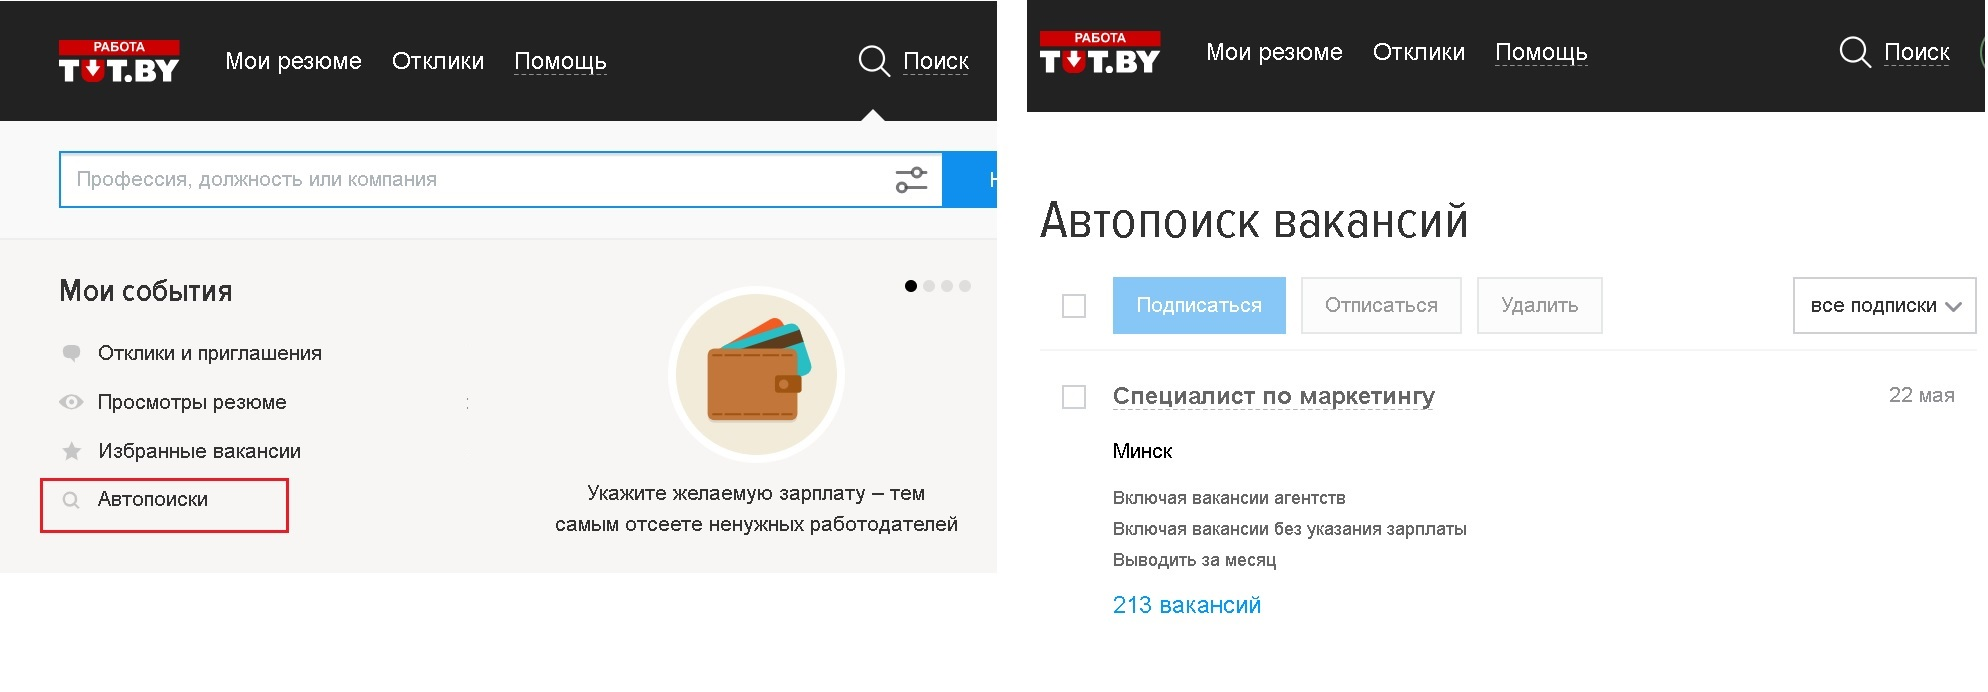 Автопоиск вакансий на rabota.tut.by